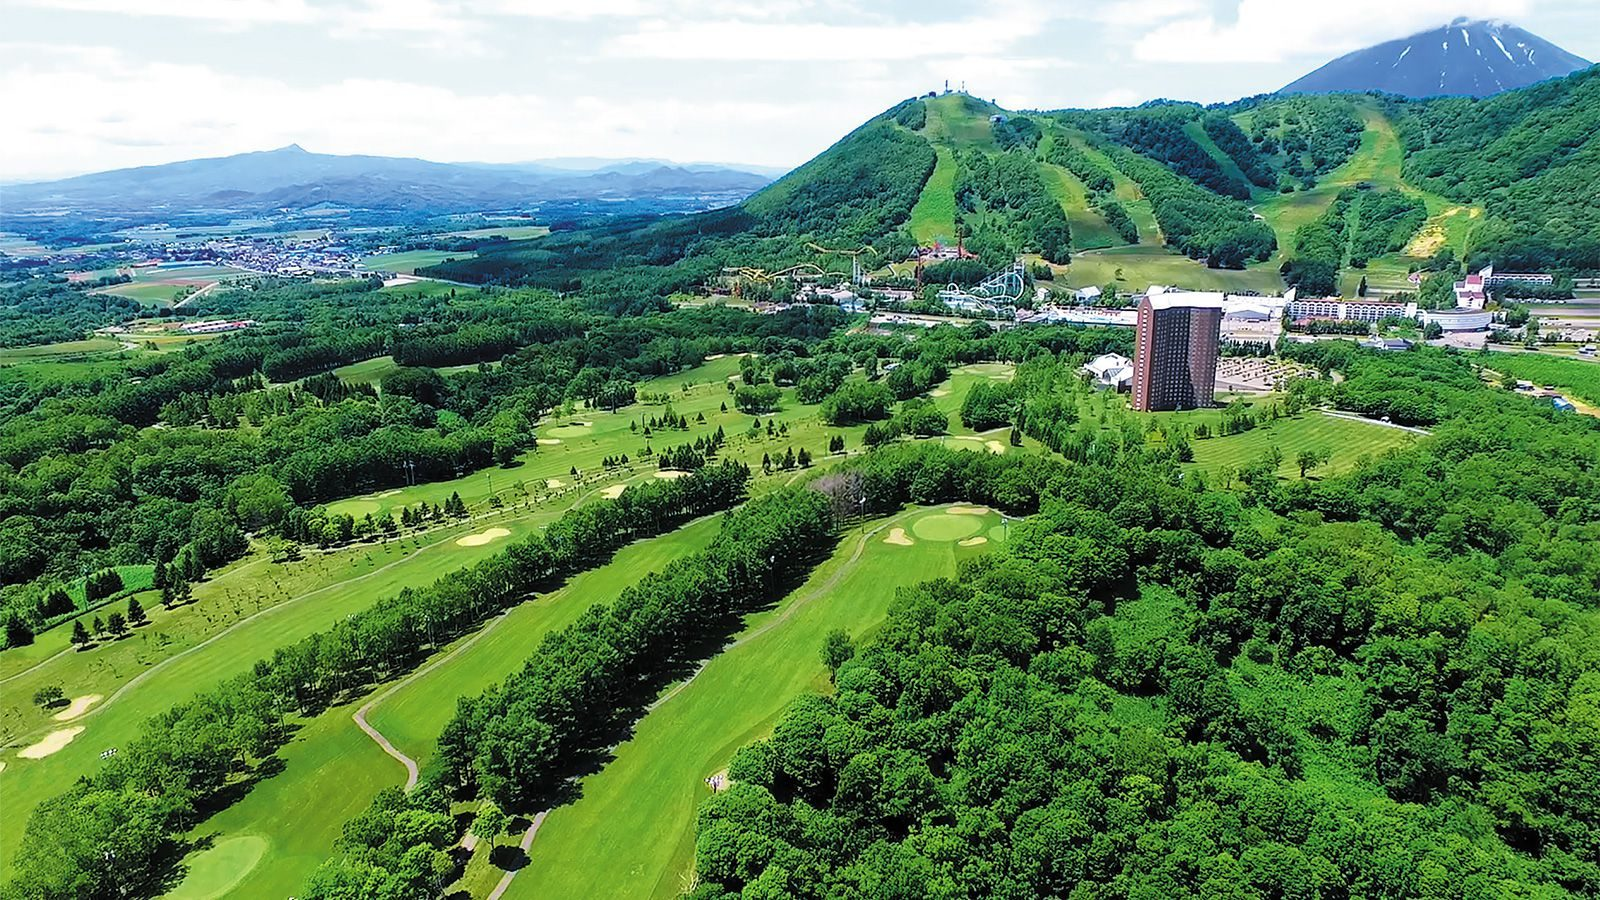 Resort Golf Courses in Hokkaido